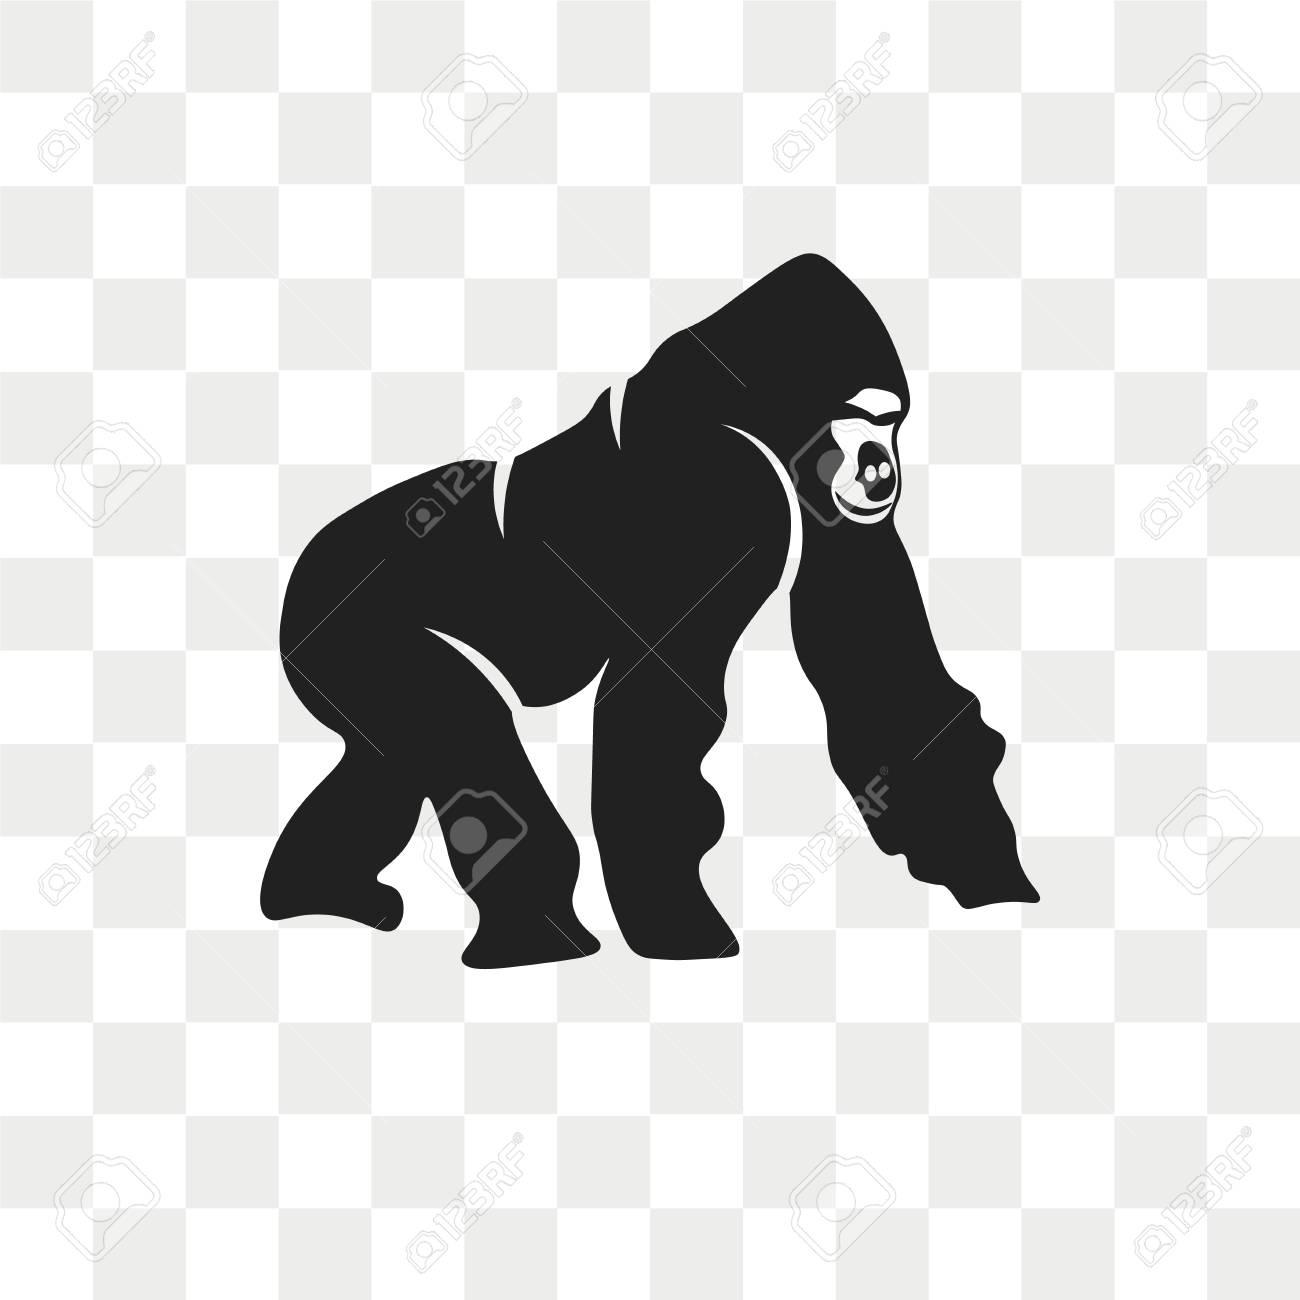 2754646aa Gorilla vector icon isolated on transparent background, Gorilla logo  concept Stock Vector - 108559574